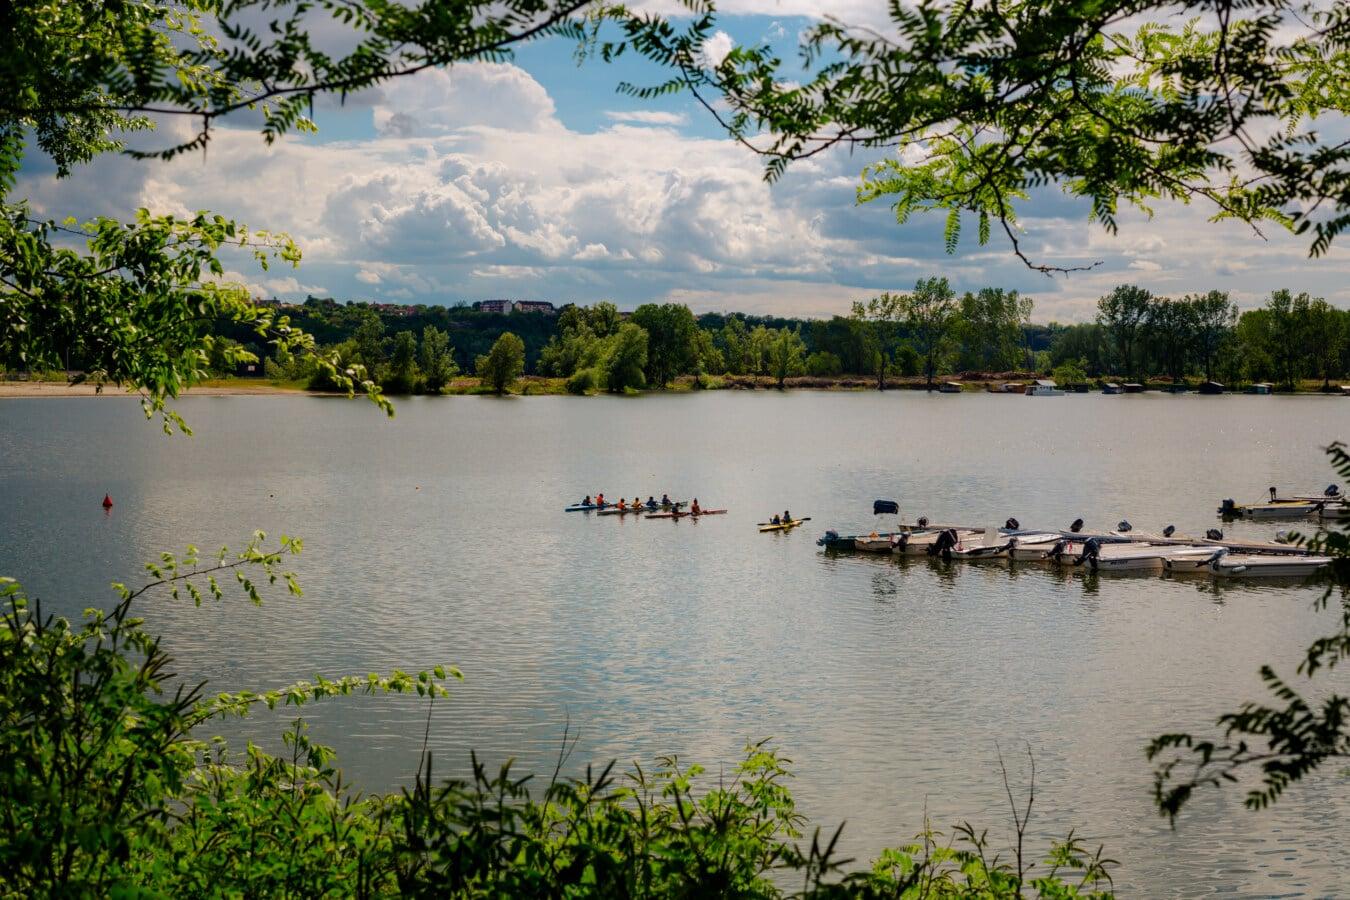 kayak, kayaking, harbor, boats, recreation, water, forest, shore, river, lakeside